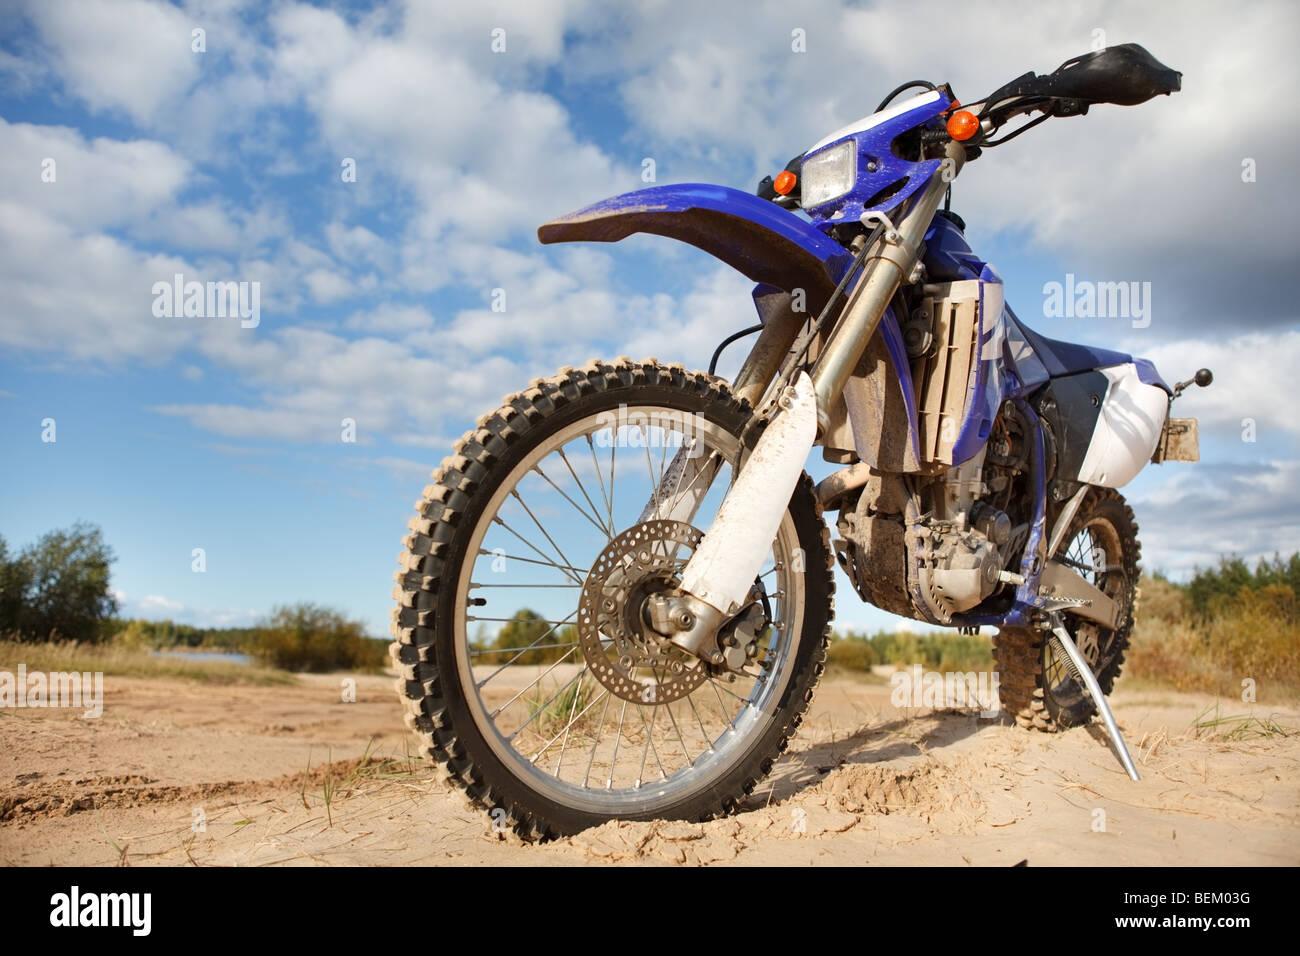 Off-road motorbike for outdoor adventure - Stock Image